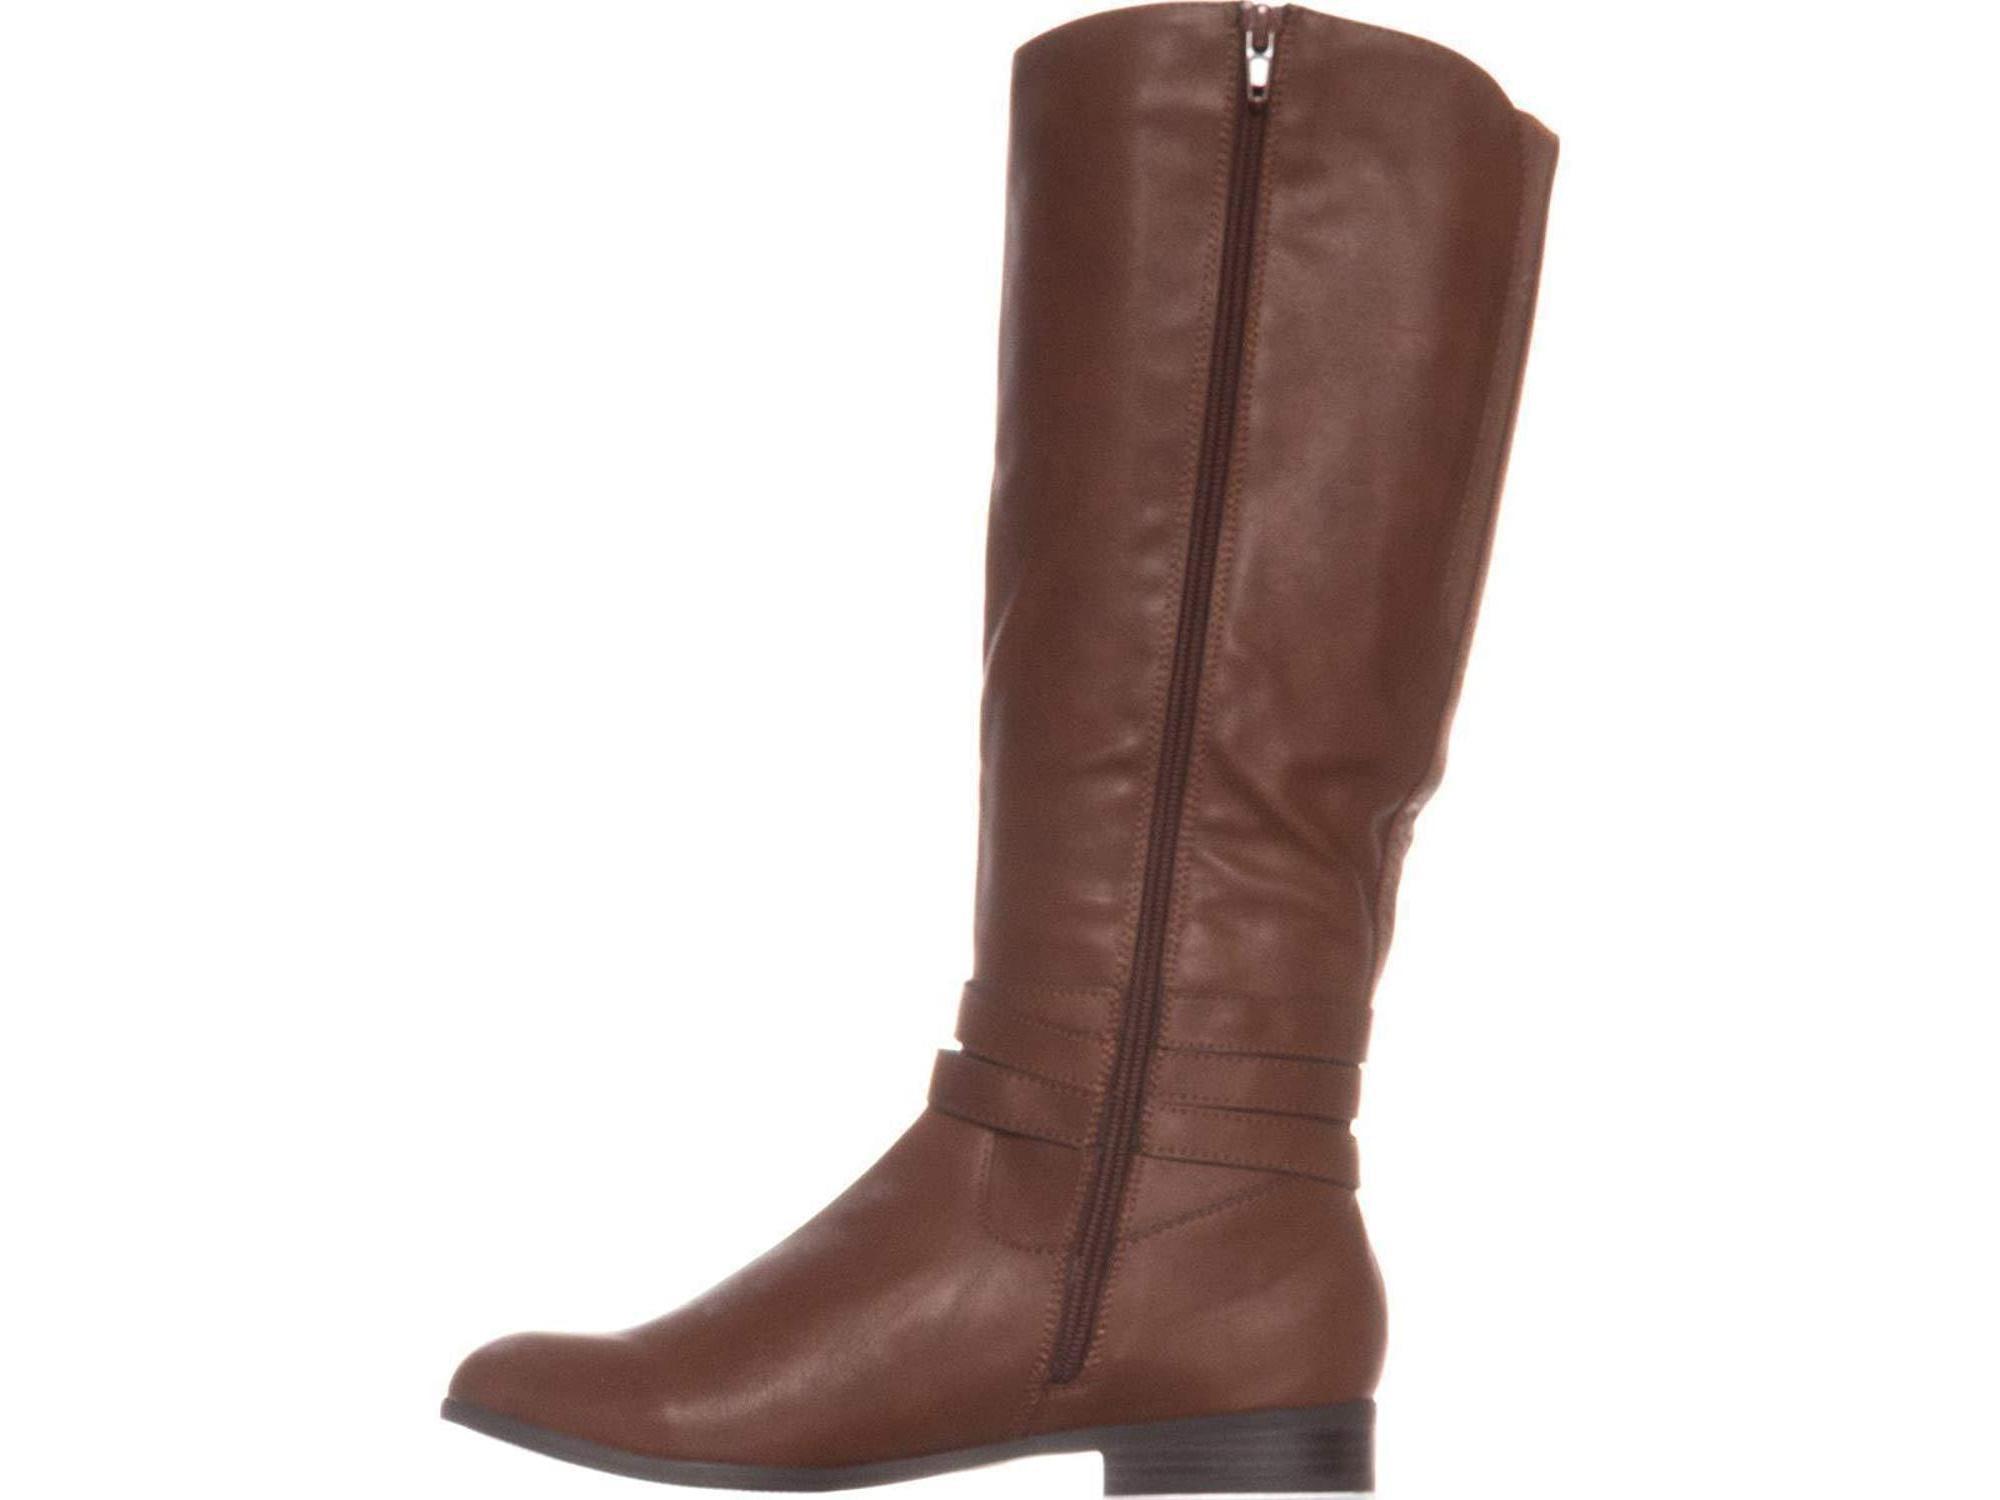 Style & Co. Damenschuhe Keppur Closed Toe Knee Fashion High Fashion Knee Stiefel 20e332